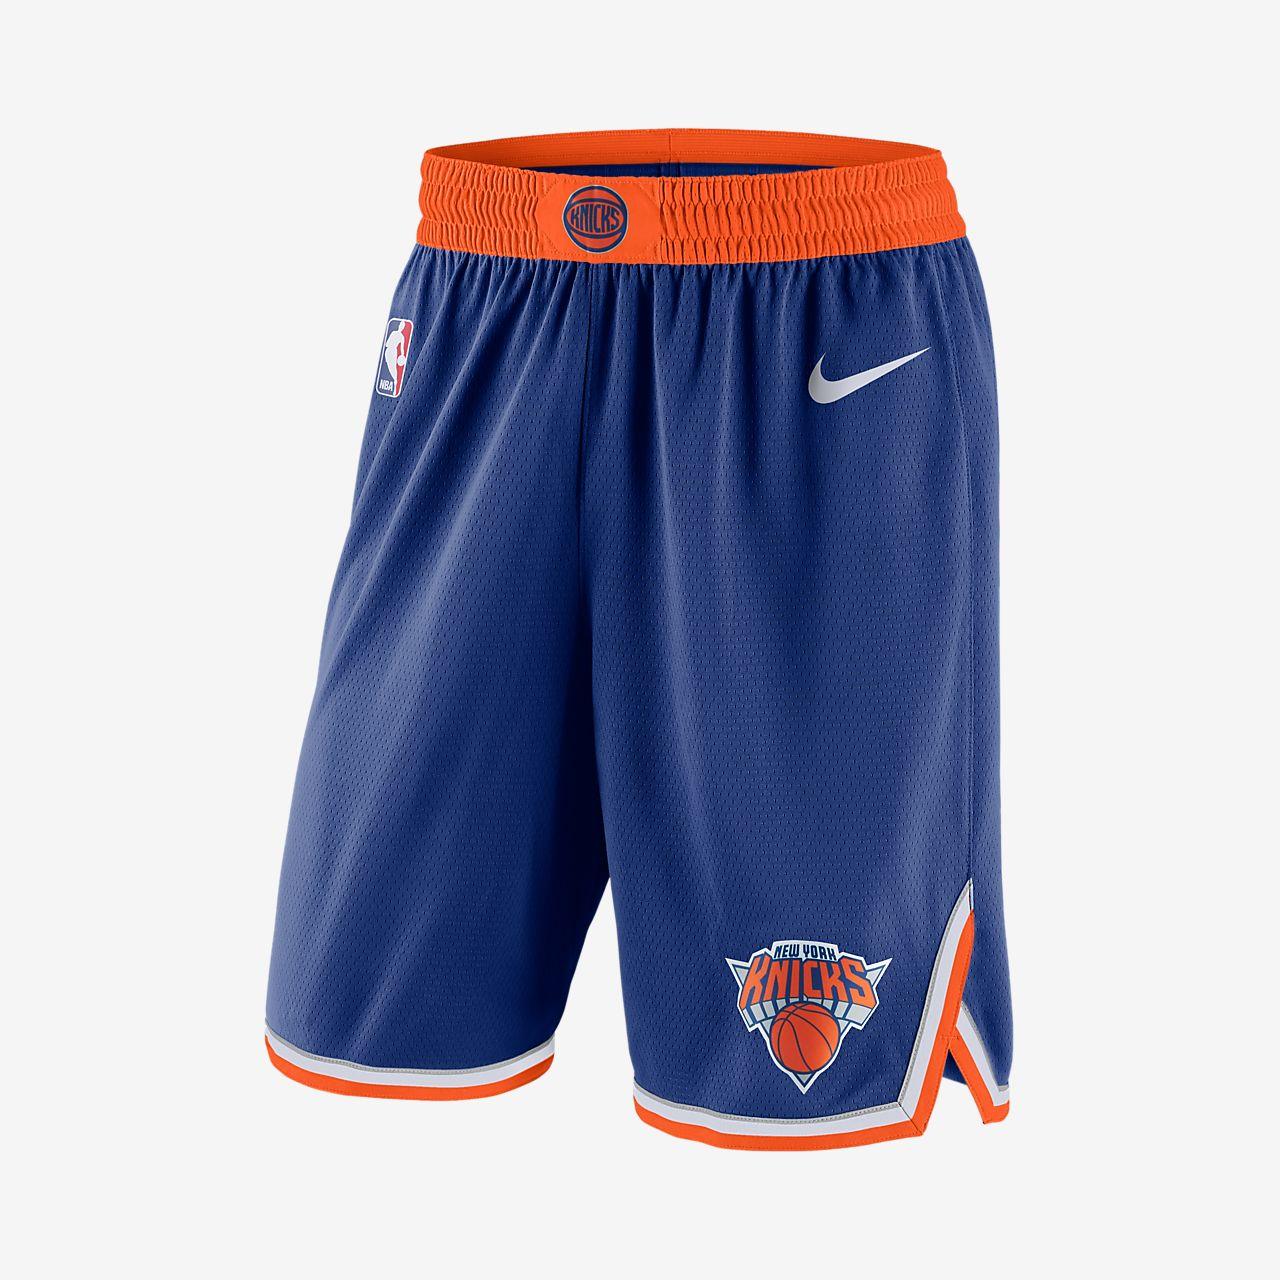 New York Knicks Nike Icon Edition Swingman Pantalons curts de l'NBA - Home